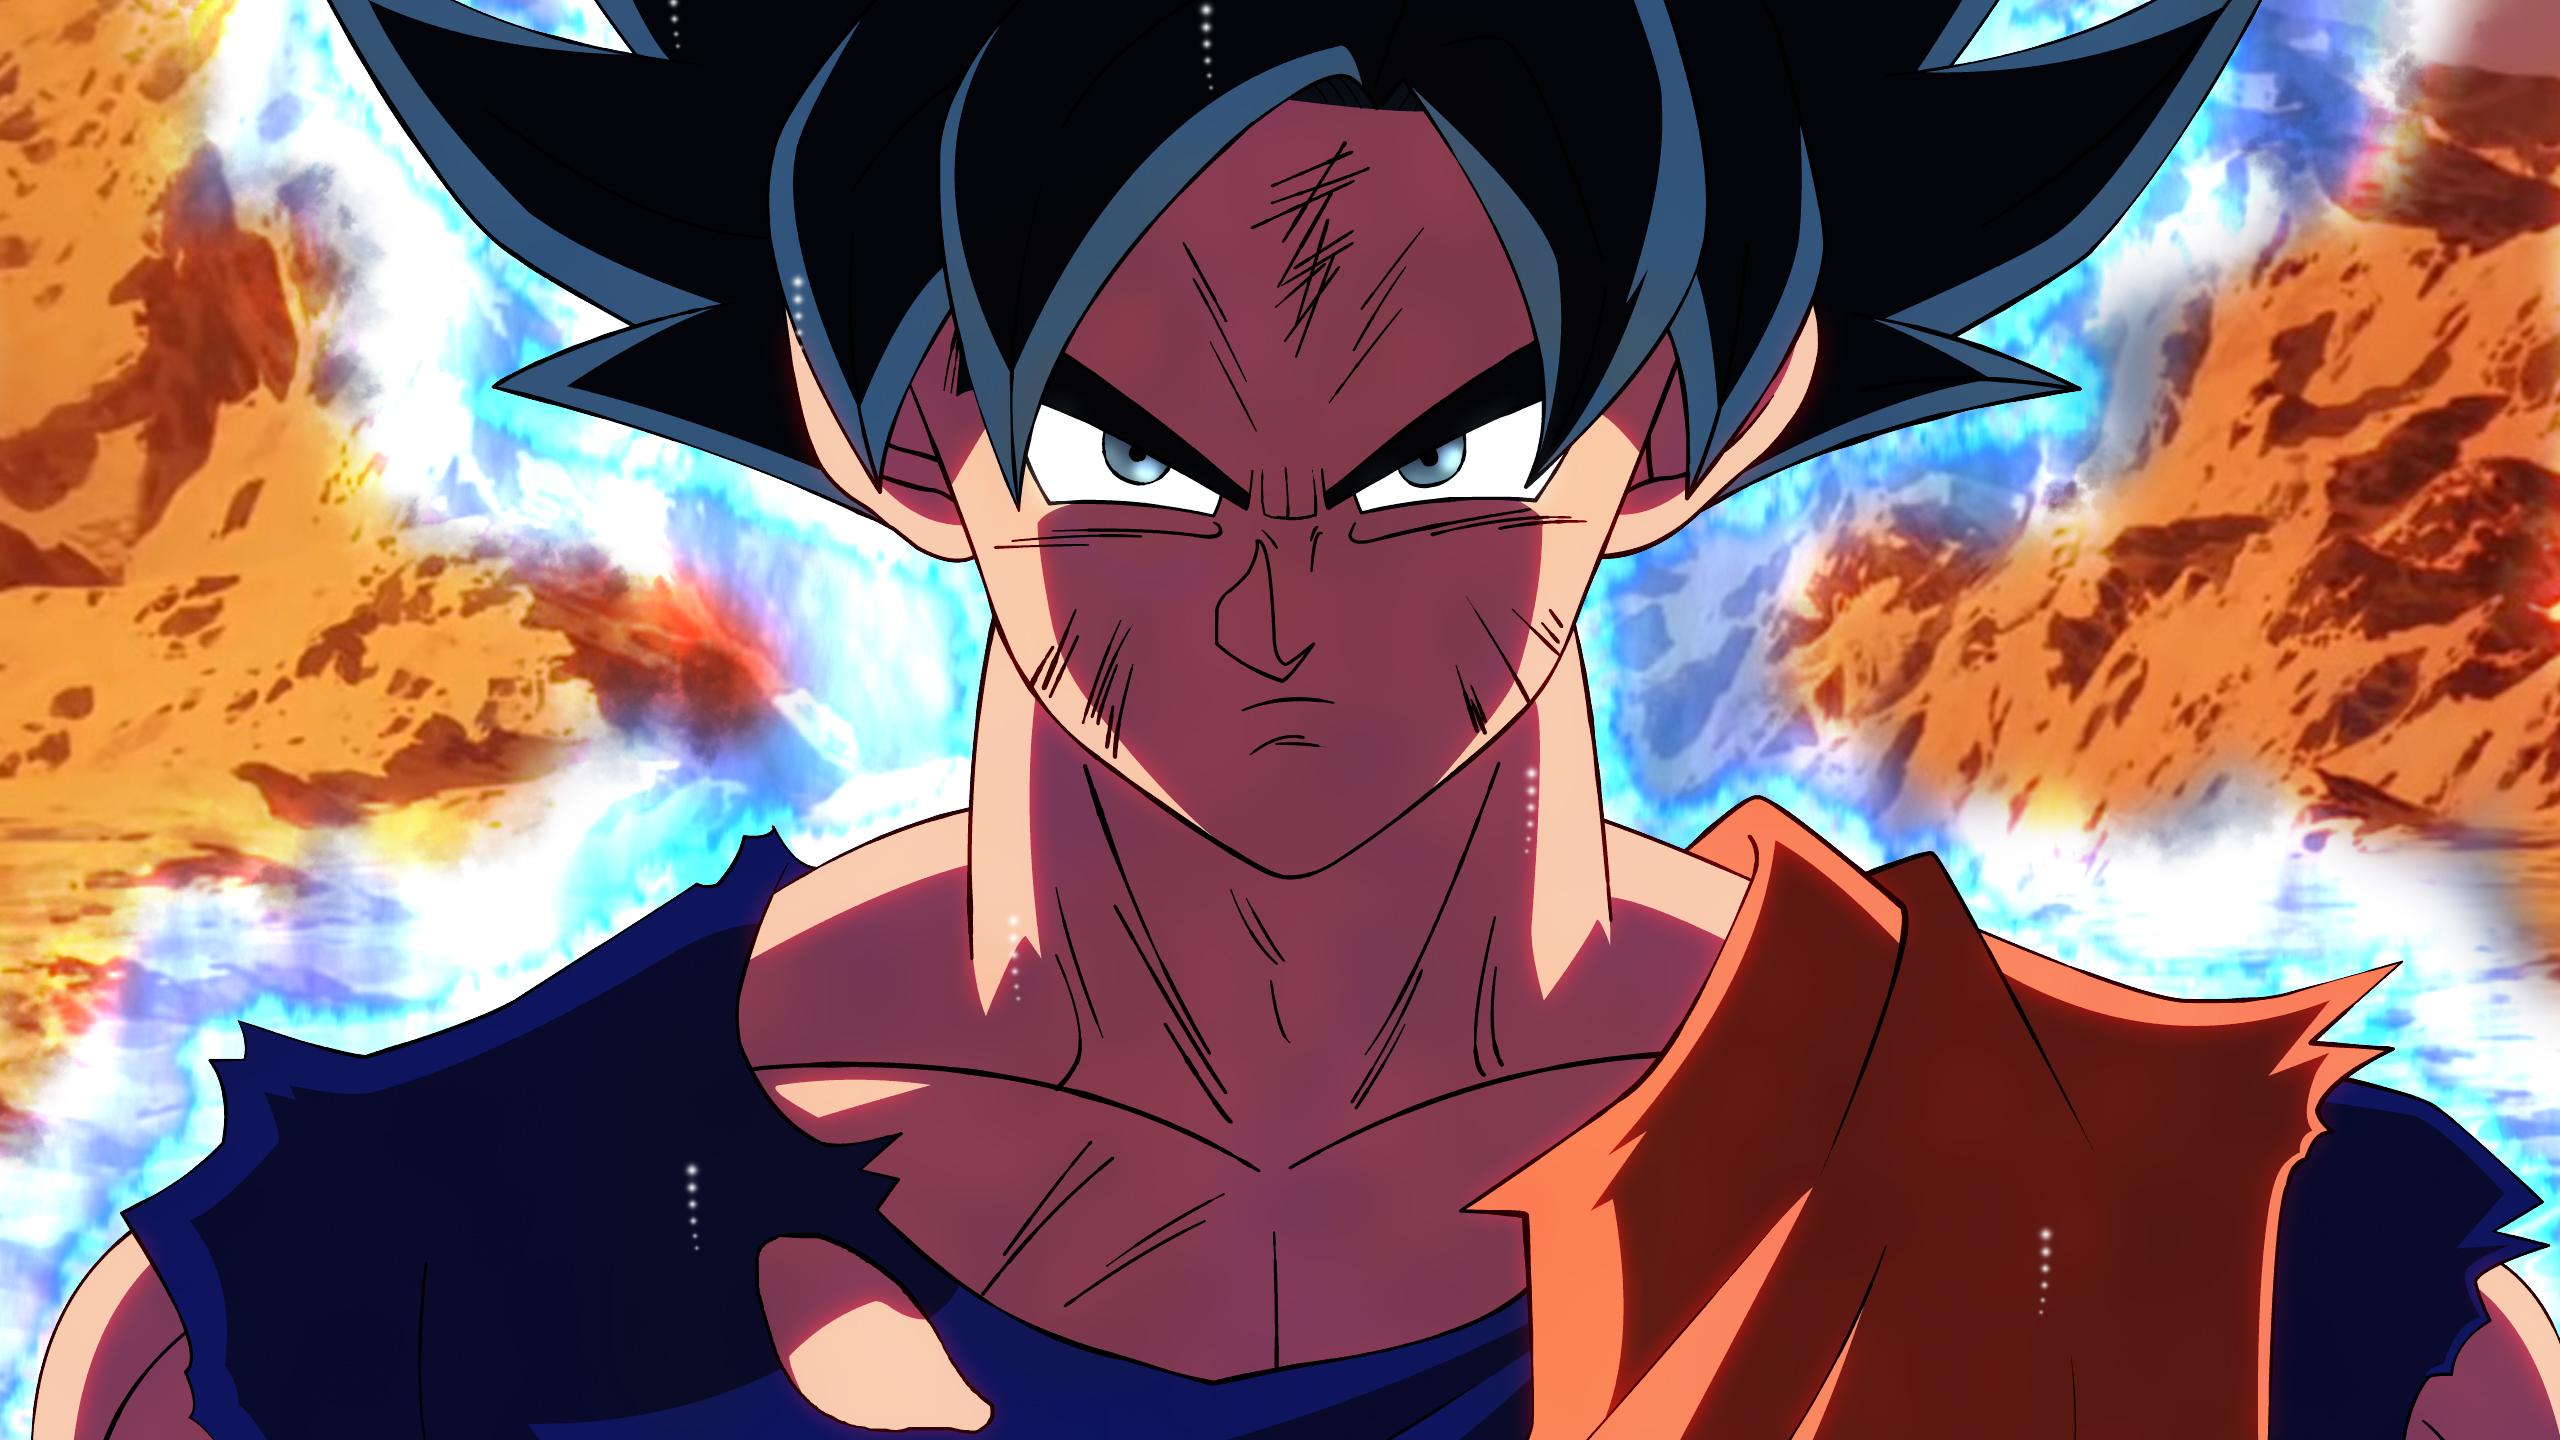 Goku Hd Wallpaper Background Image 2560x1440 Id 1016967 Wallpaper Abyss